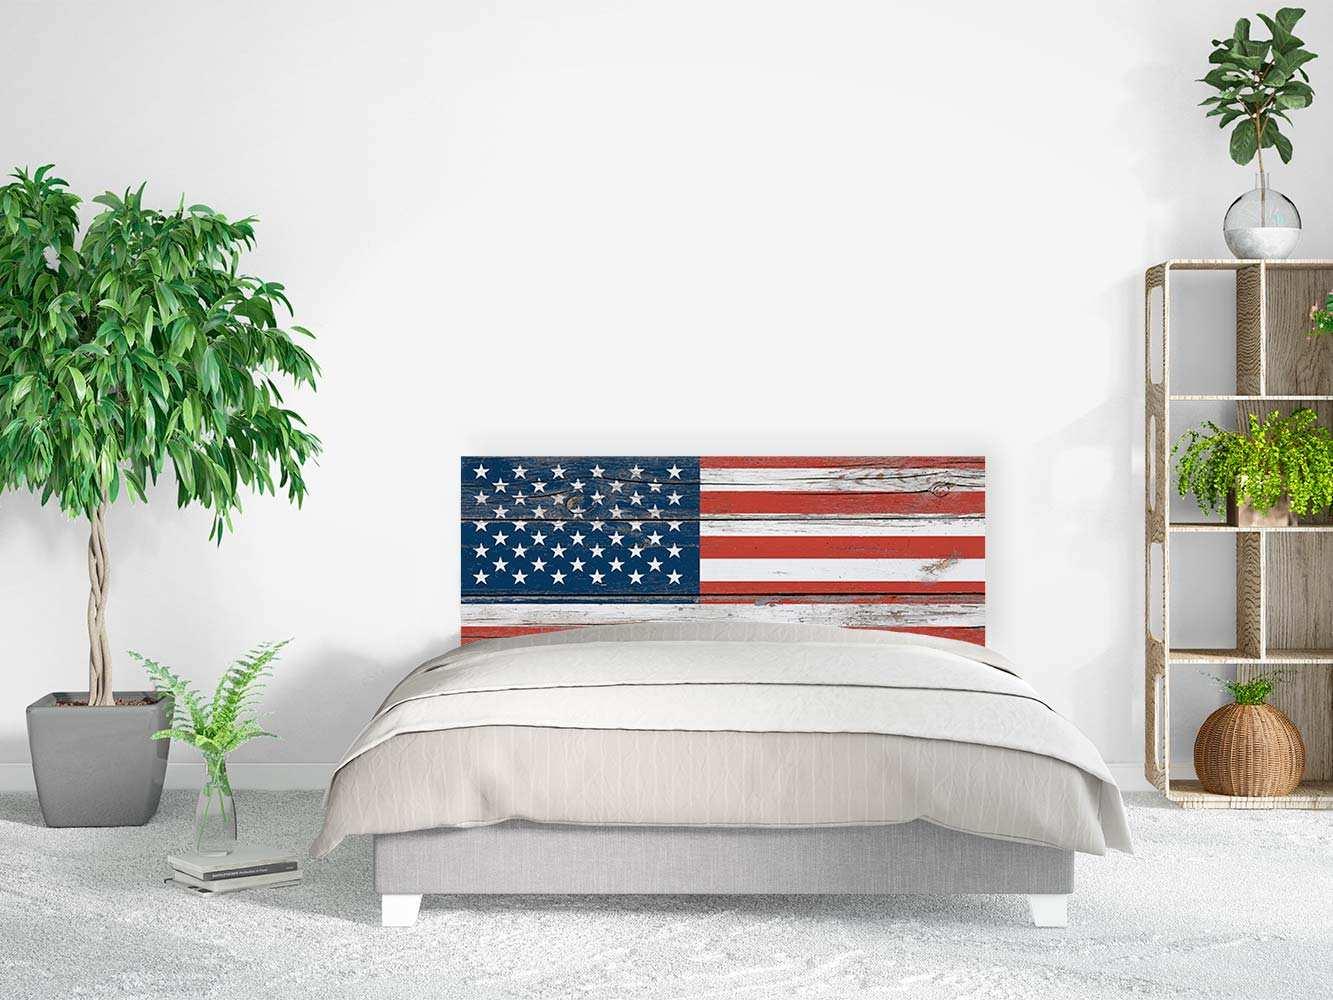 Cabecero Cama Bandera Estados Unidos   Carteles XXL - Impresión carteleria publicitaria